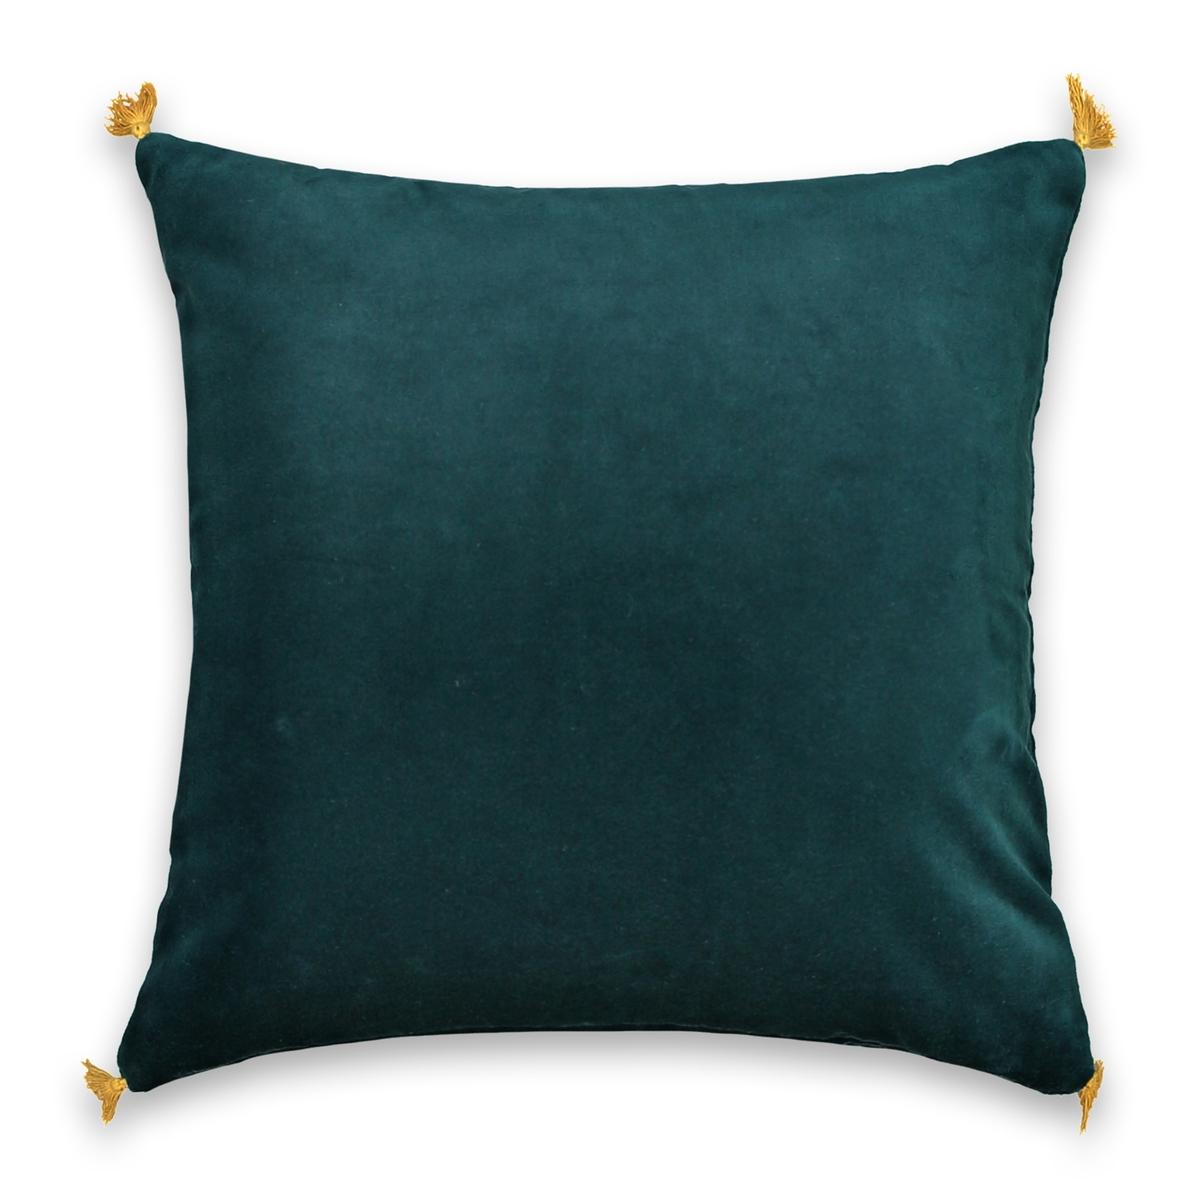 Чехол на подушку из велюра PAULA цены онлайн